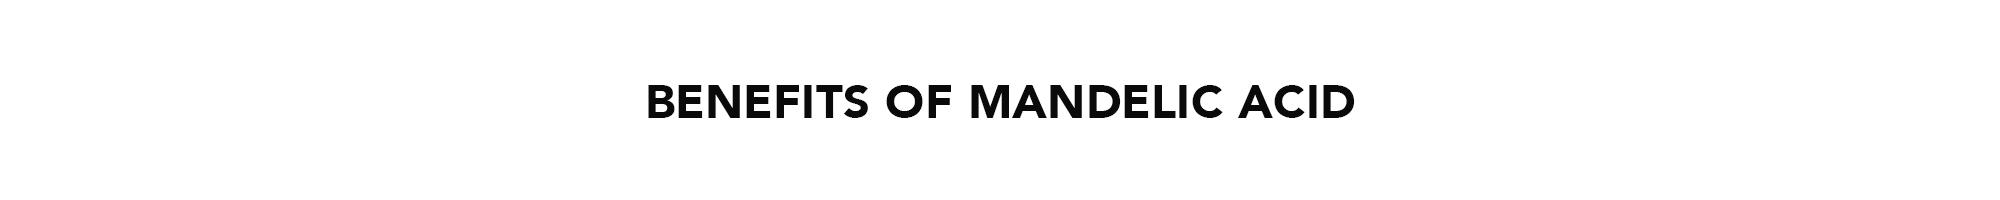 Benefits-of-Mandelic-Acid